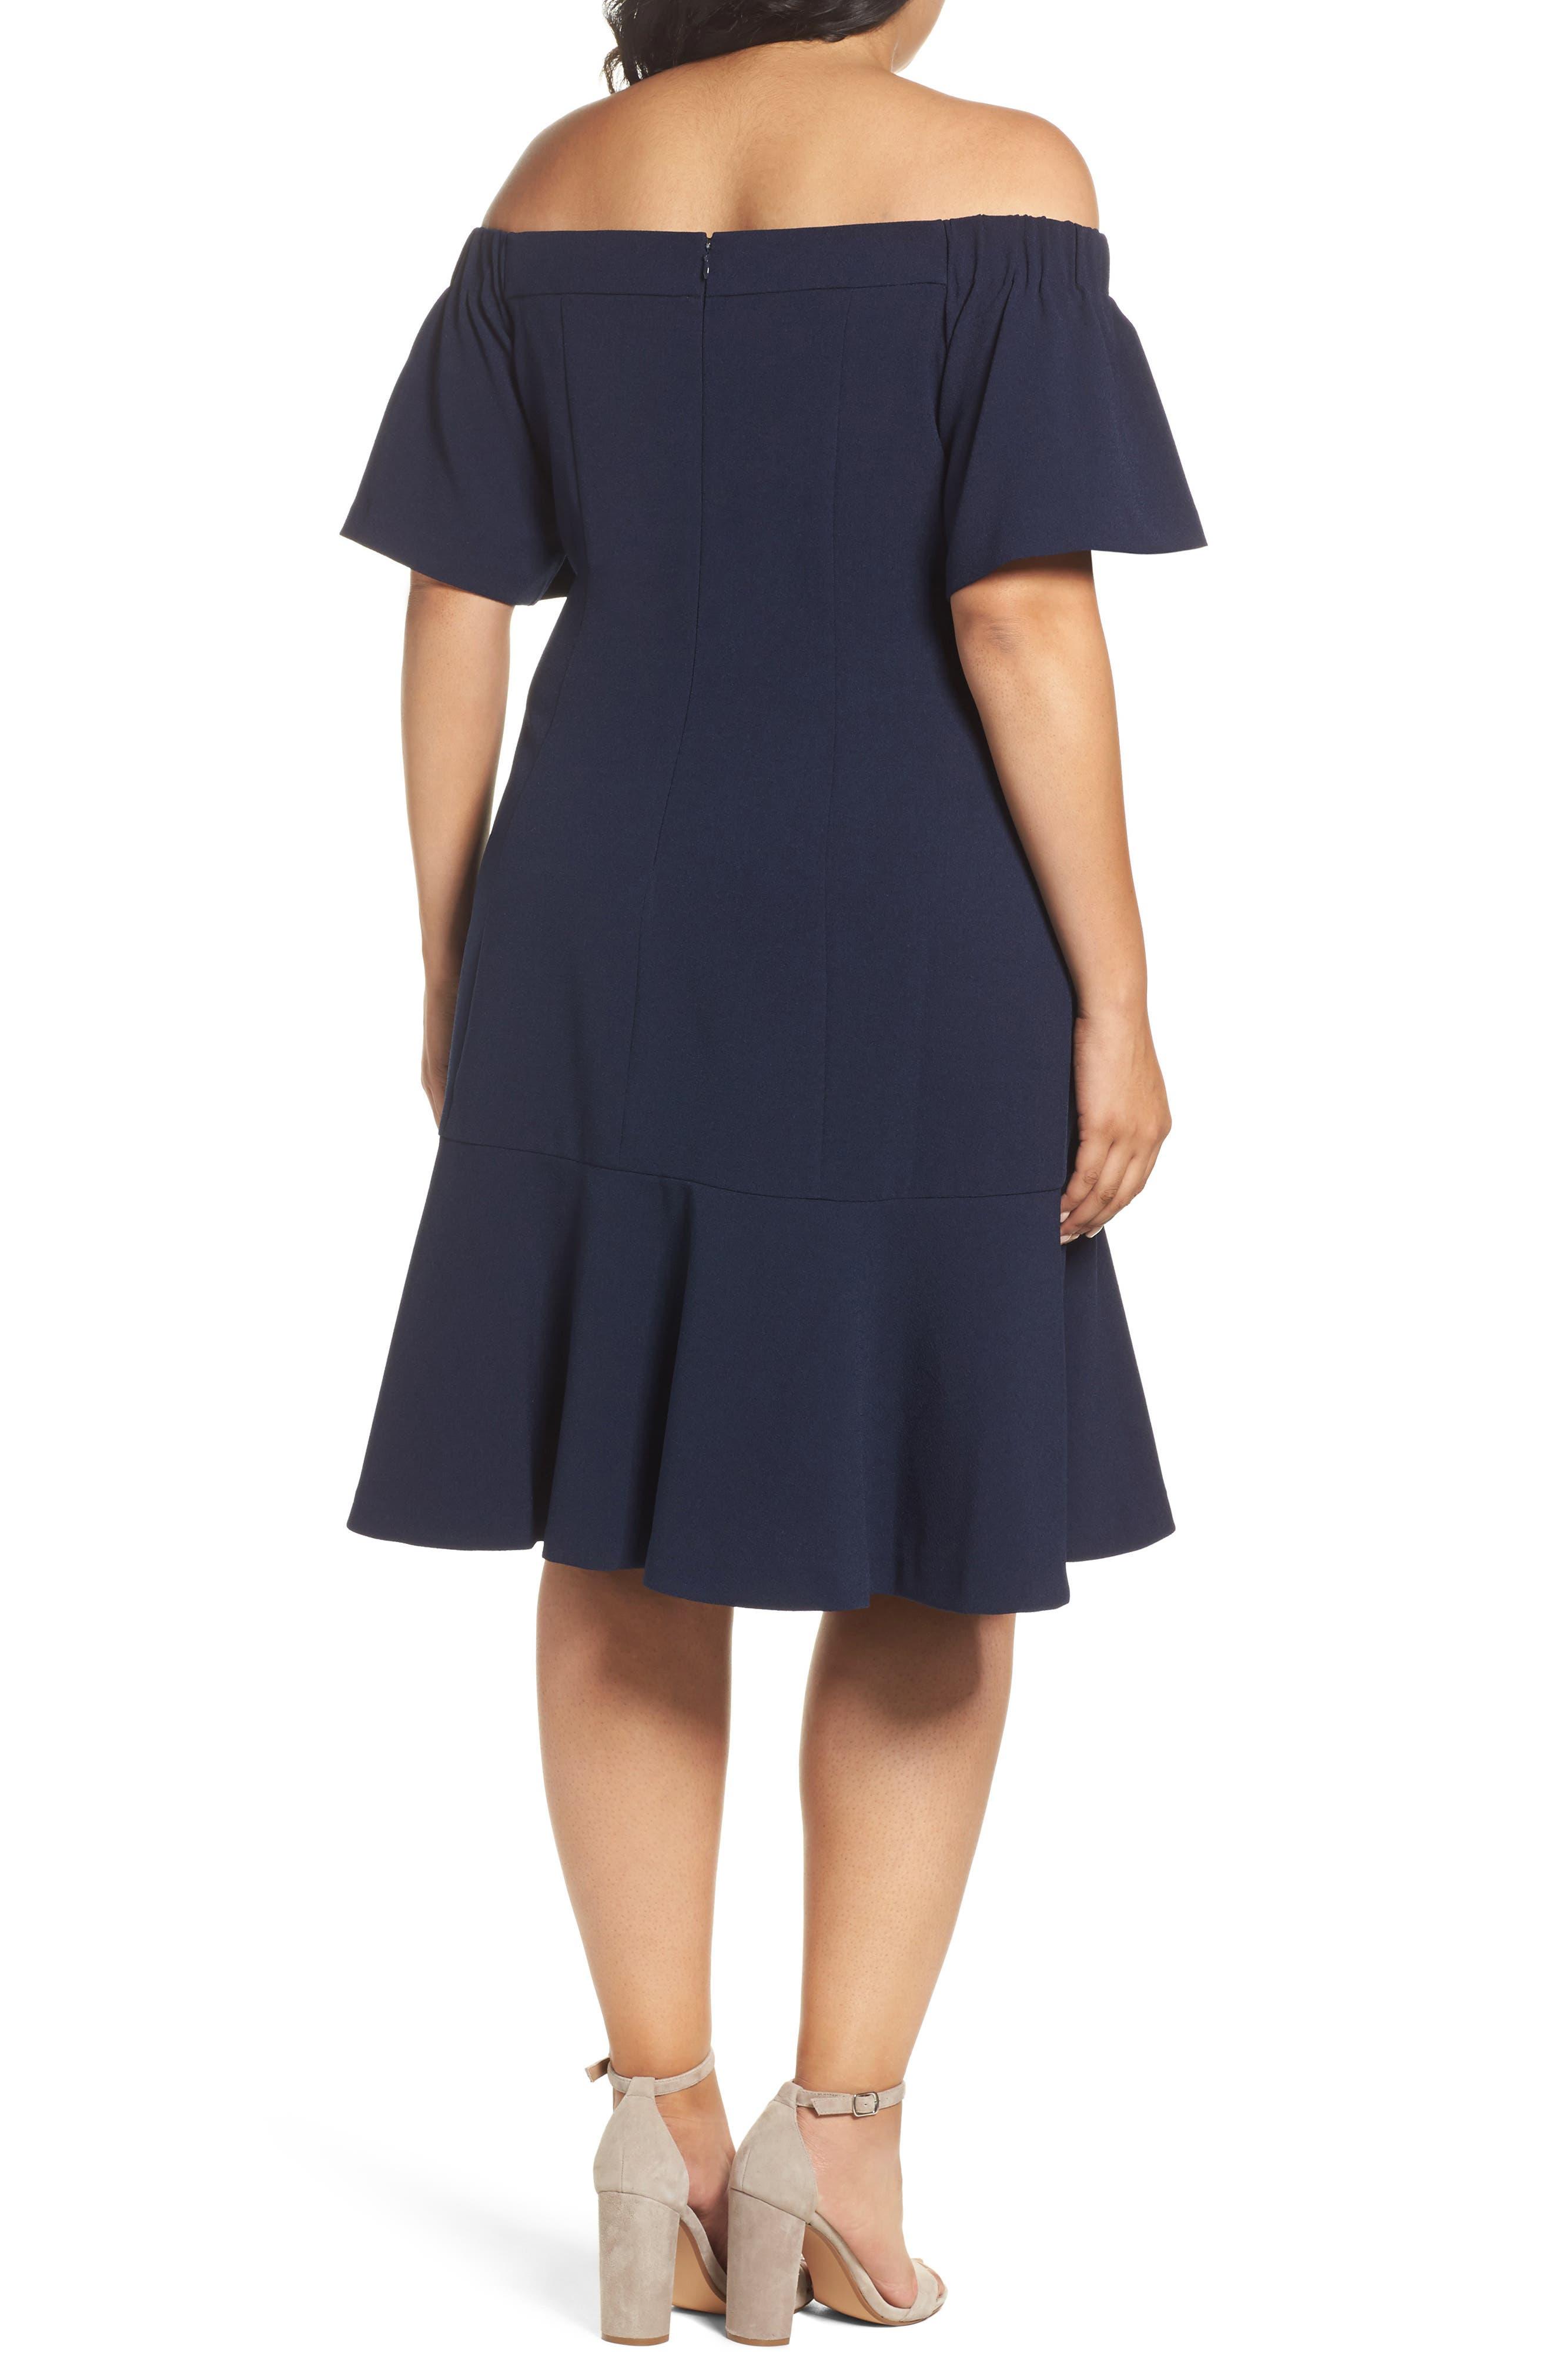 Alternate Image 2  - Vince Camuto Crepe Off the Shoulder Dress (Plus Size)